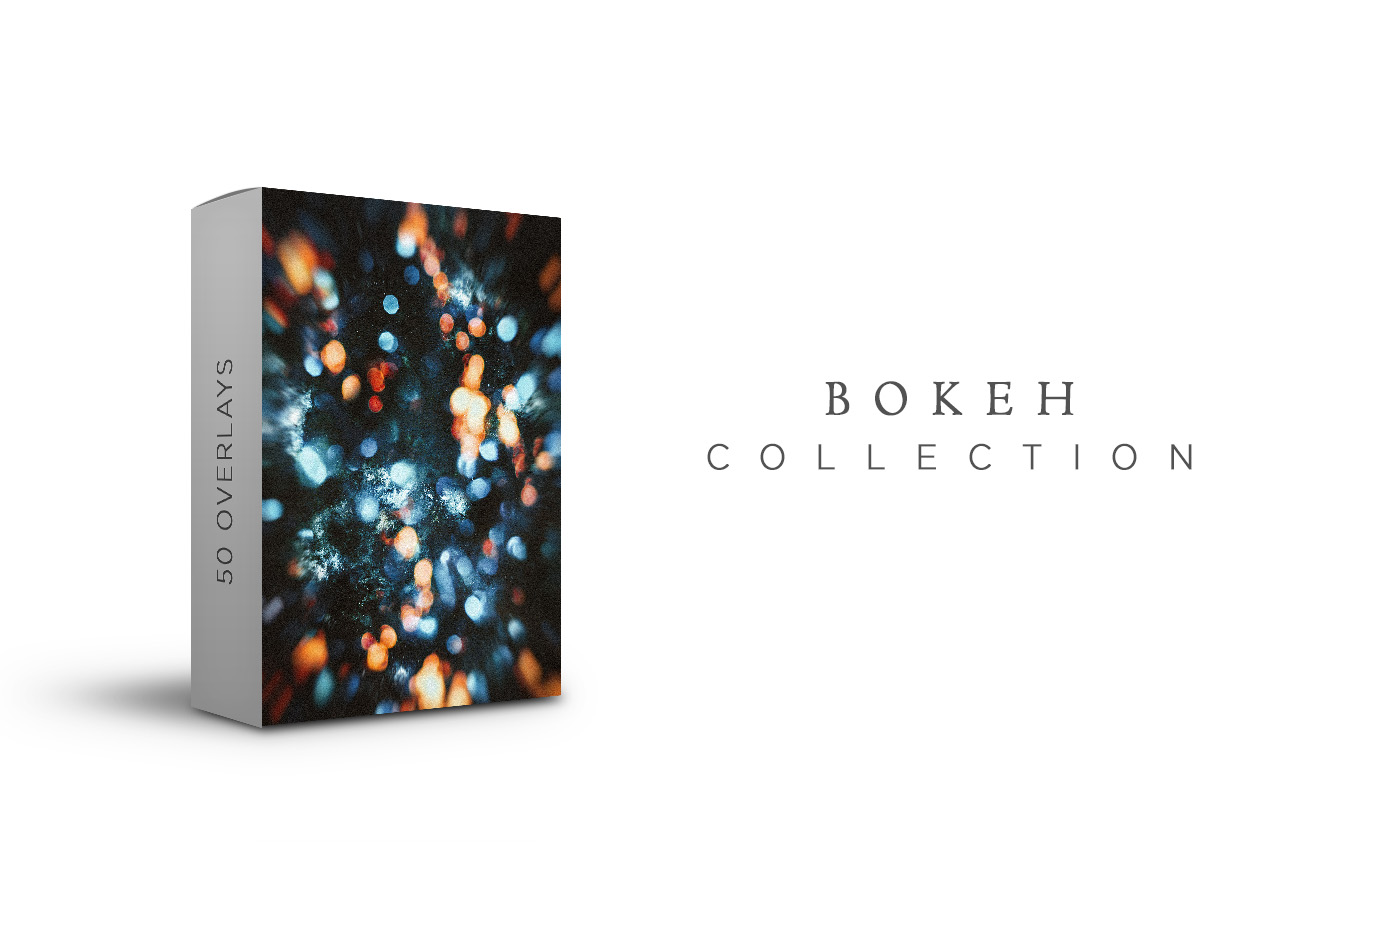 1200+ Wedding Bundle PS   LR items - 28 BOKEH -